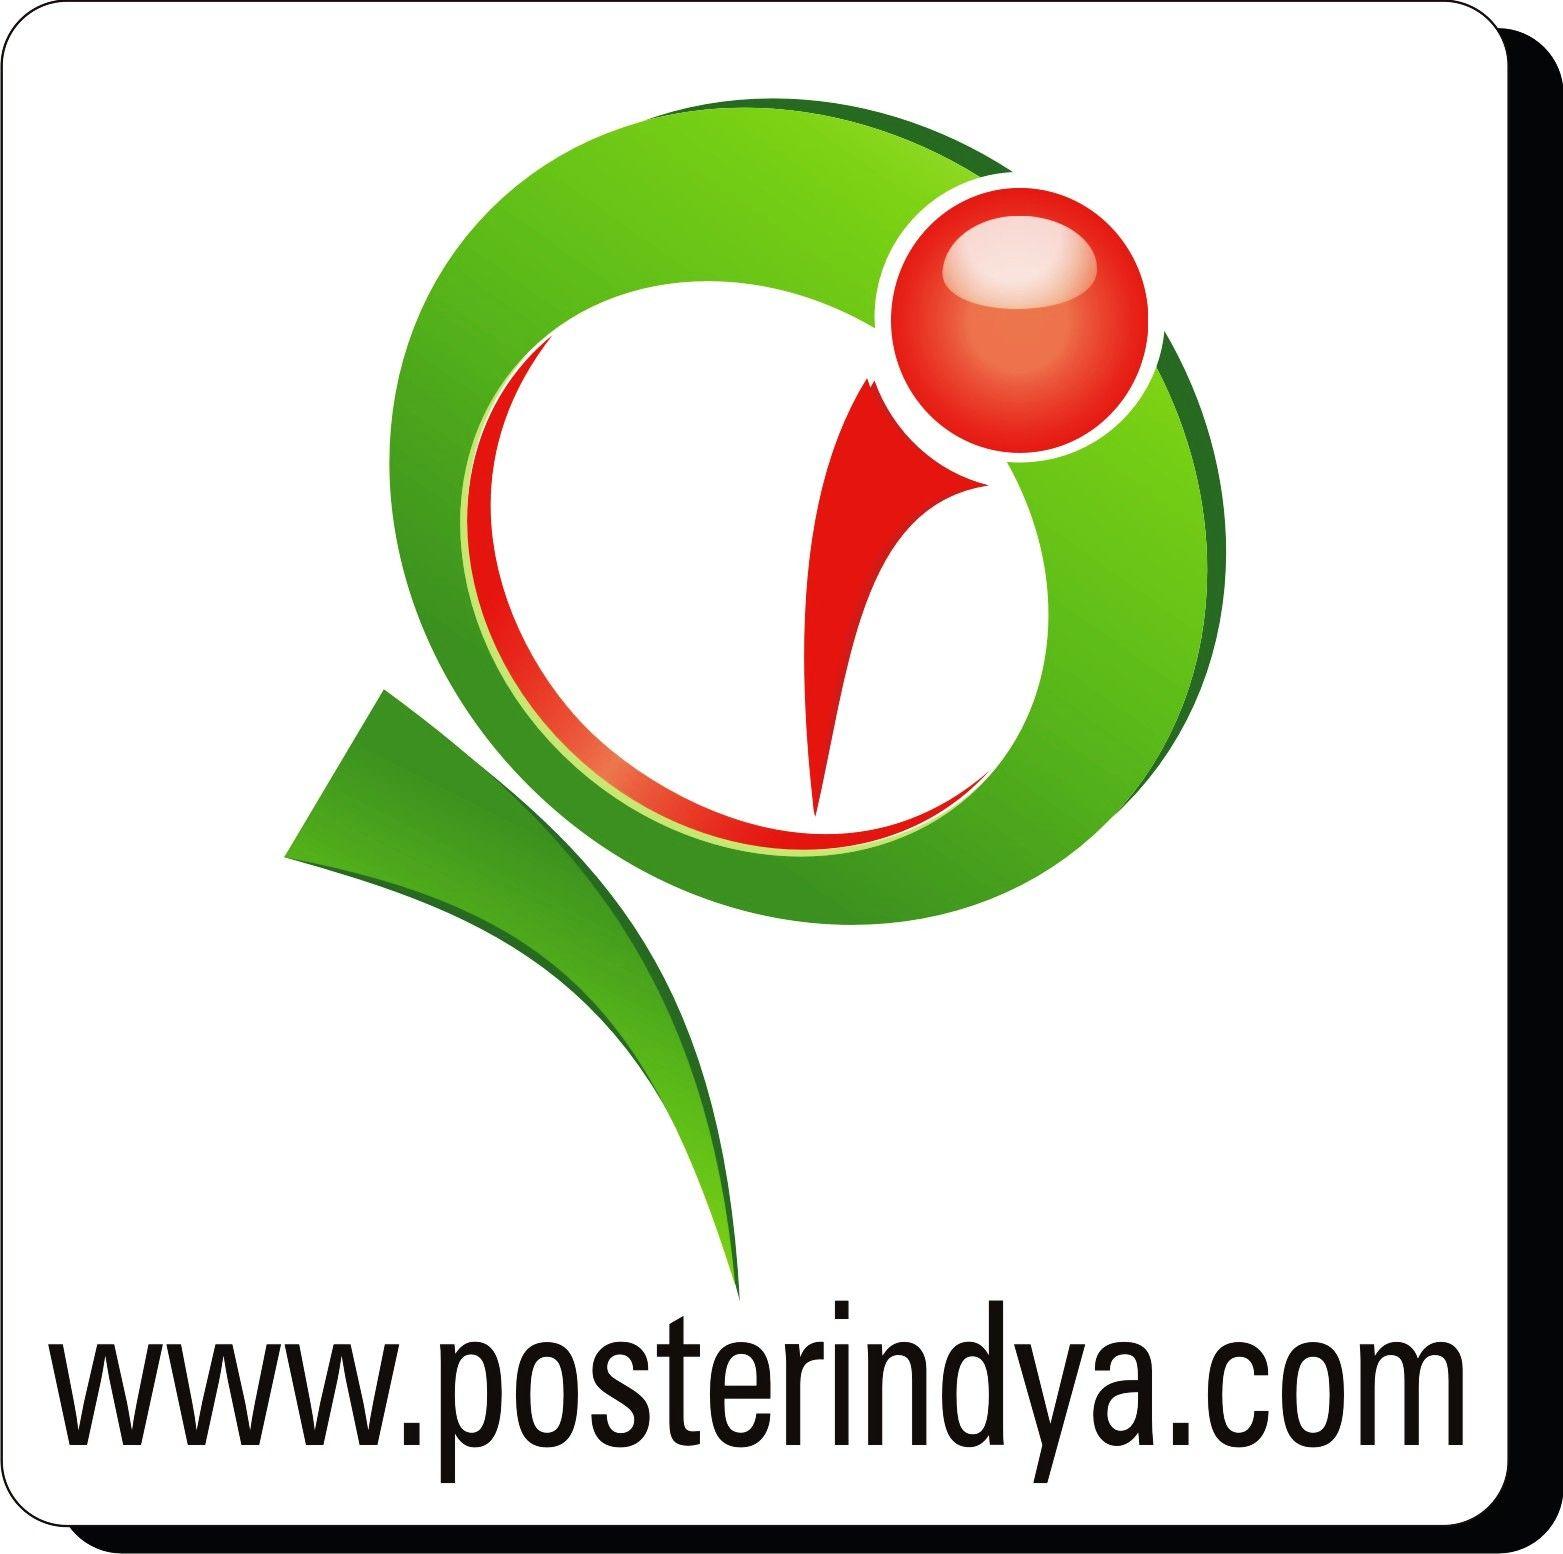 Save Environment Posters, POSTERINDYA